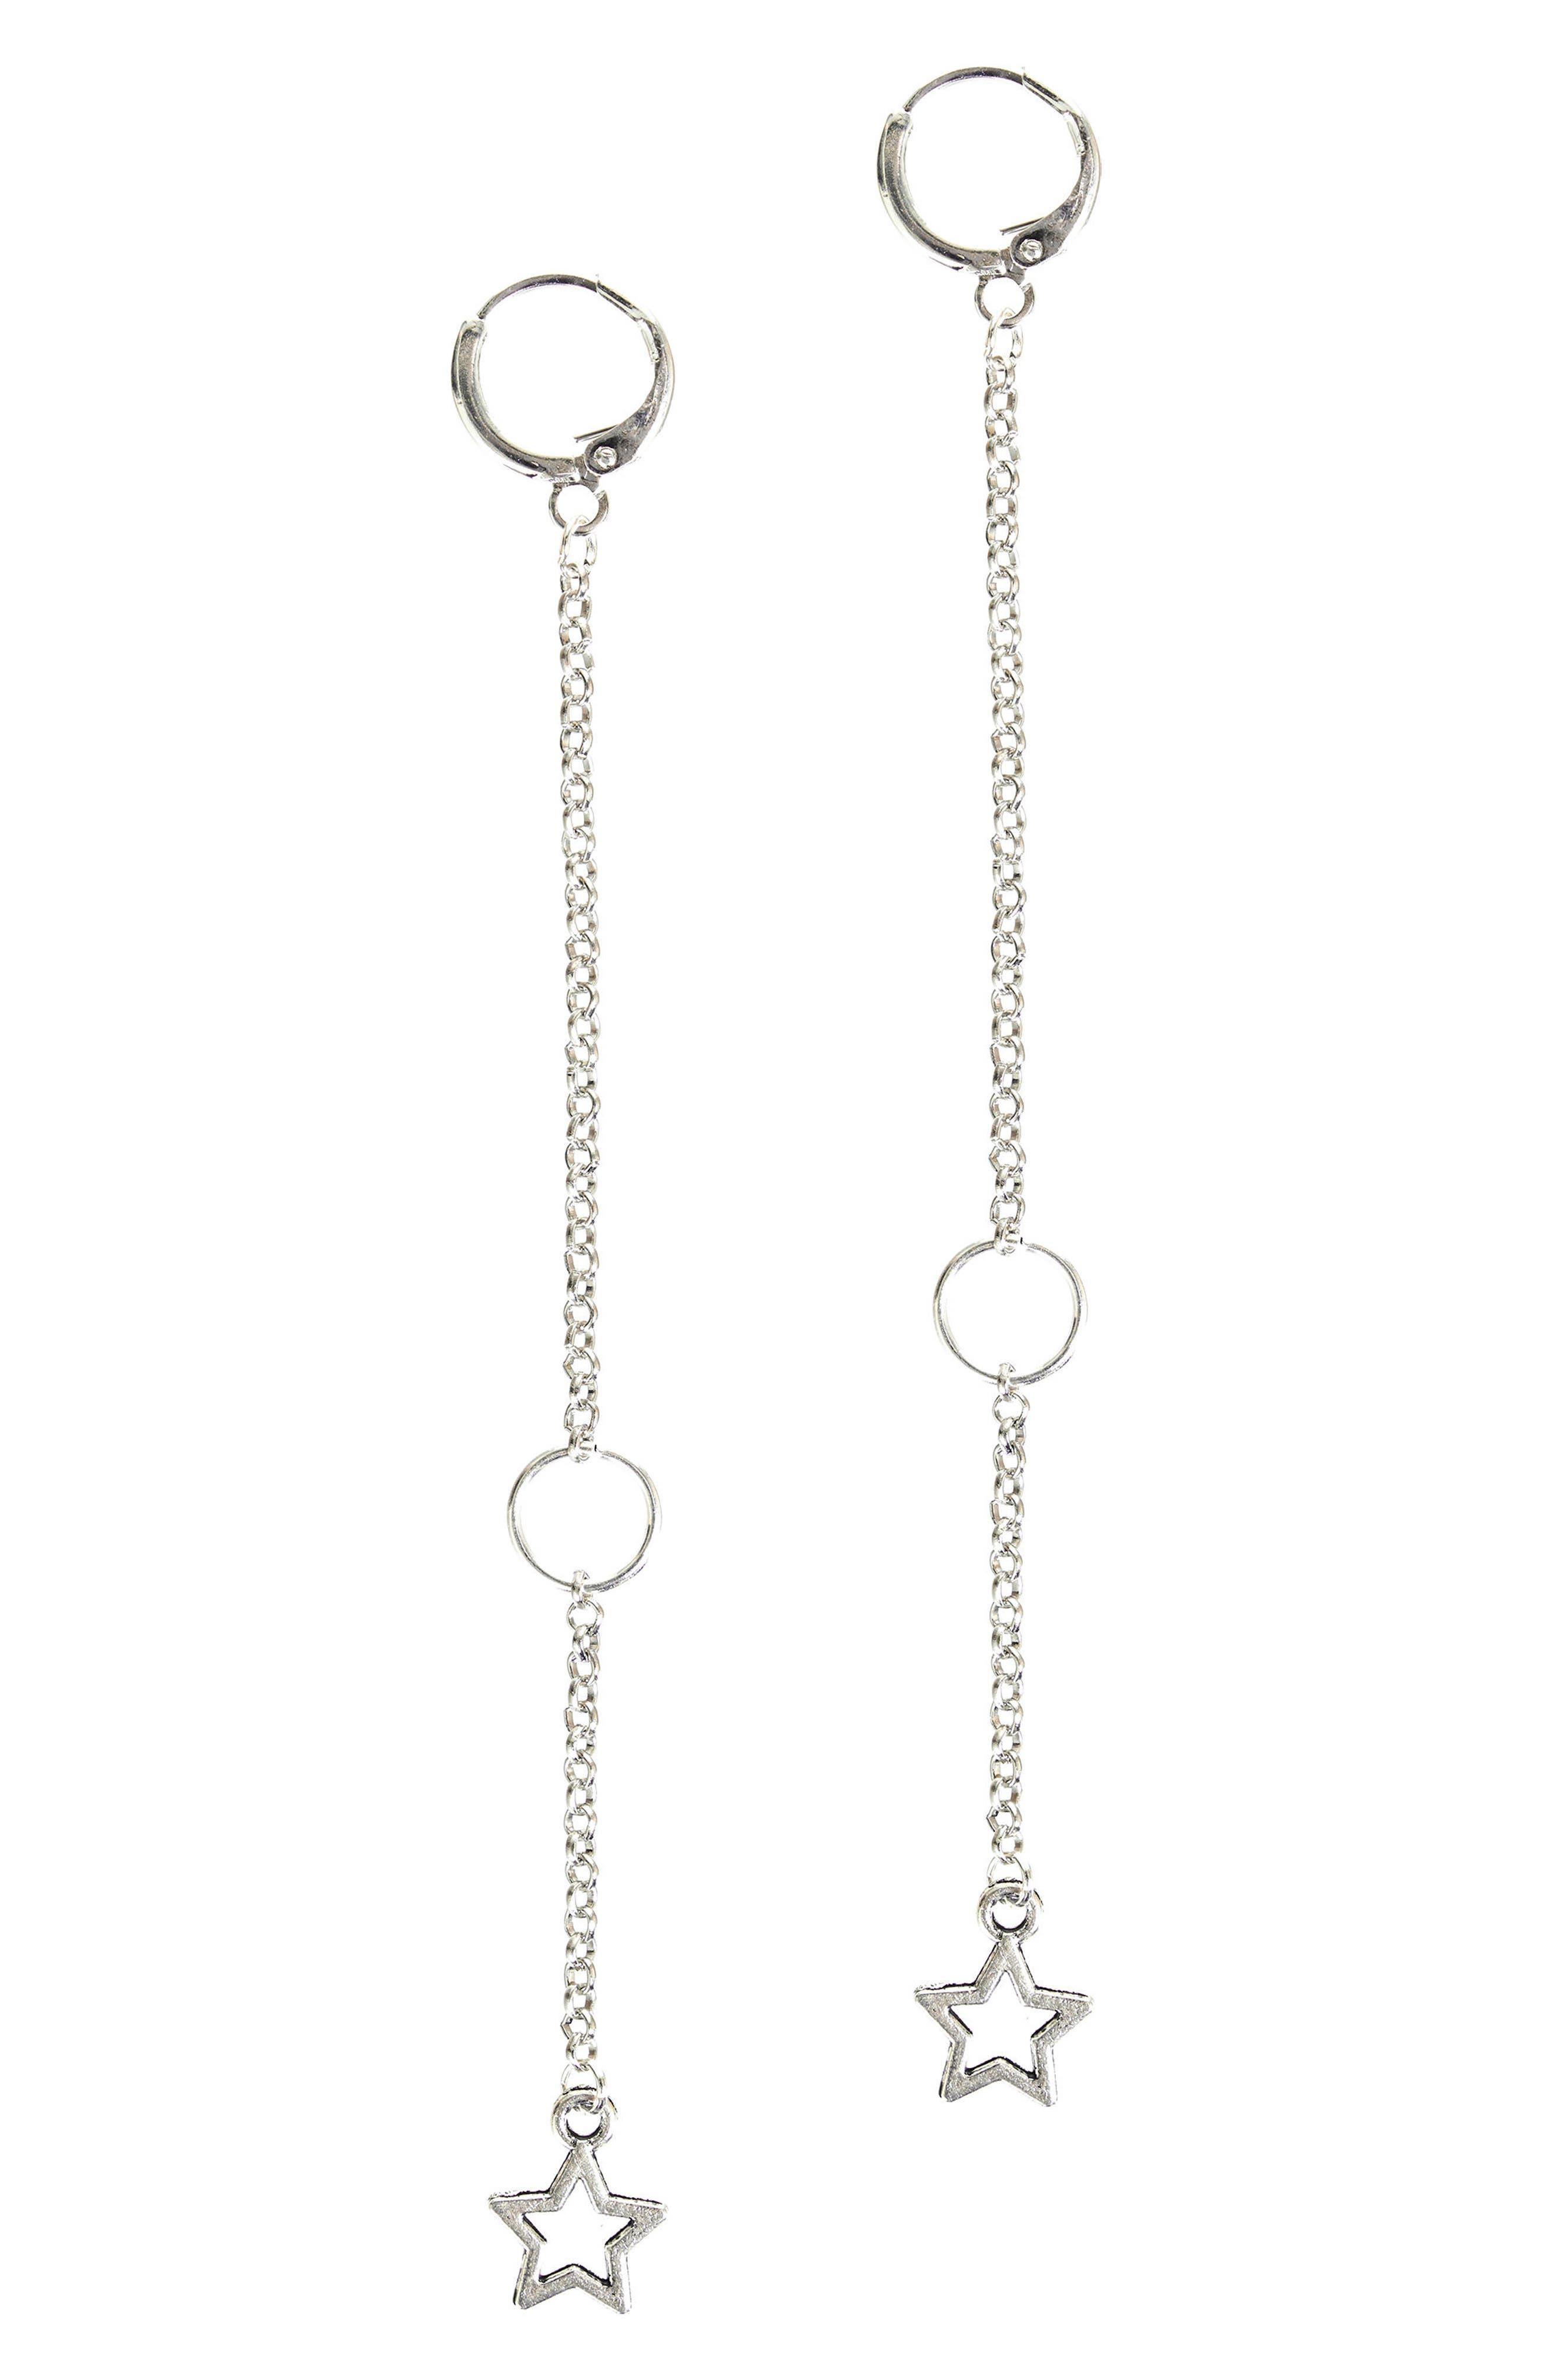 Crux Hoop Earrings,                             Main thumbnail 1, color,                             040